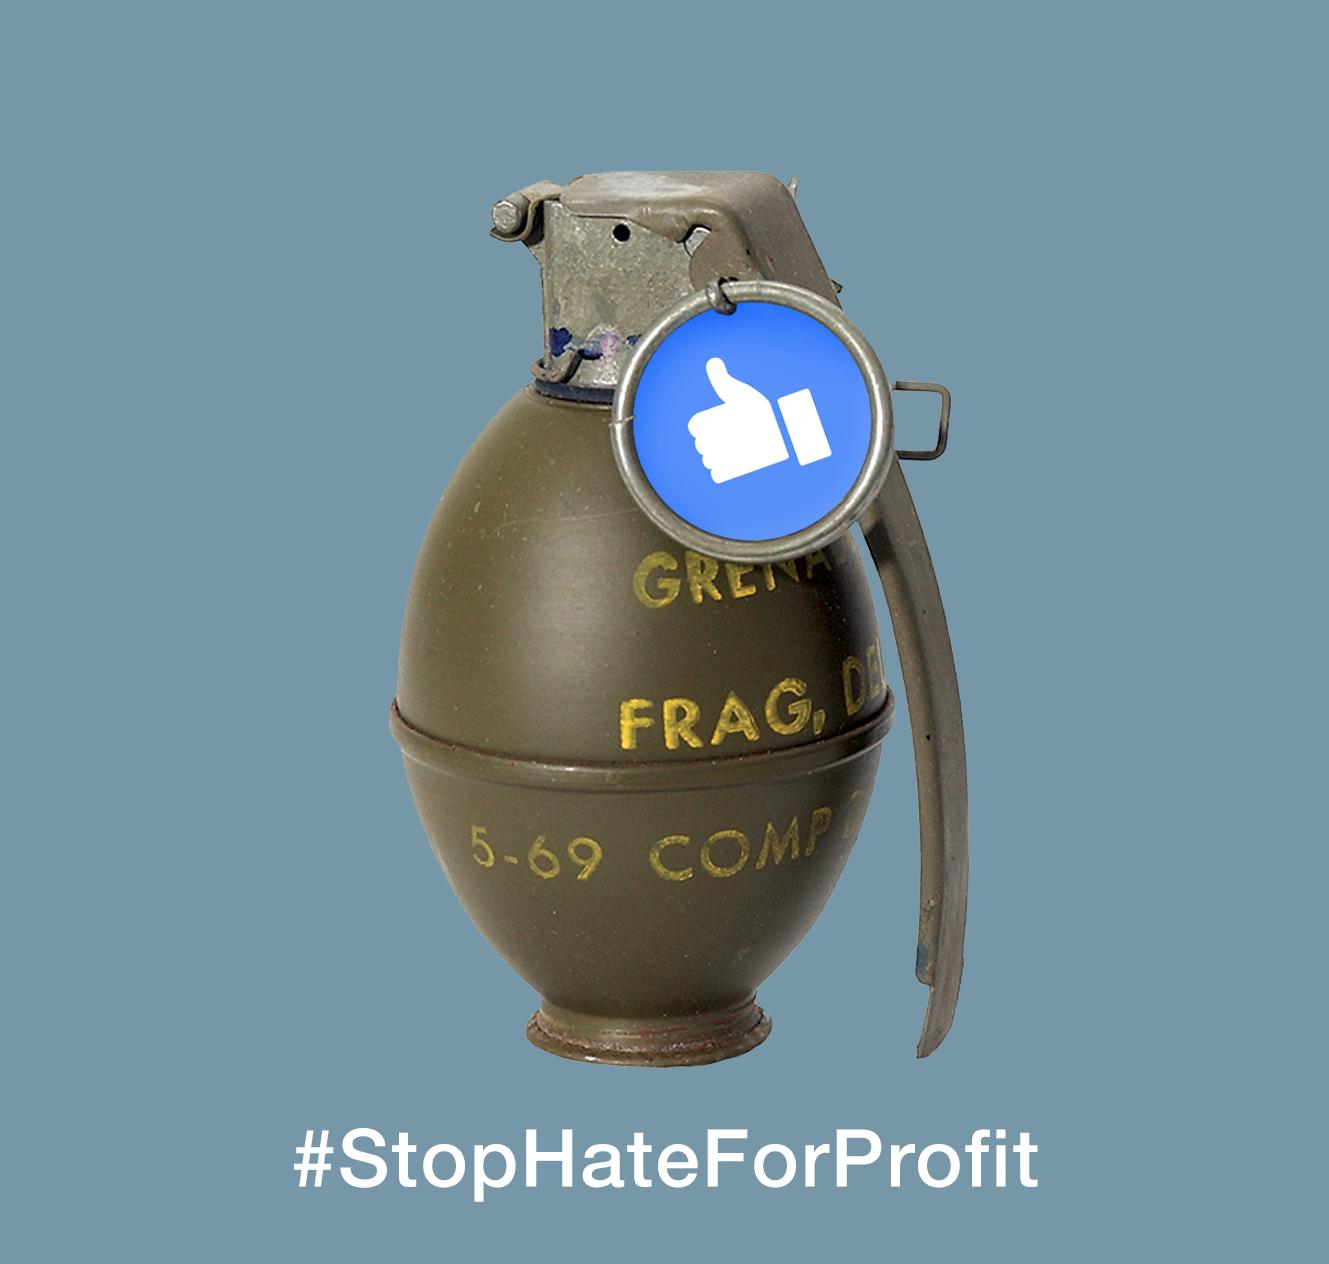 #StopHateForProfit